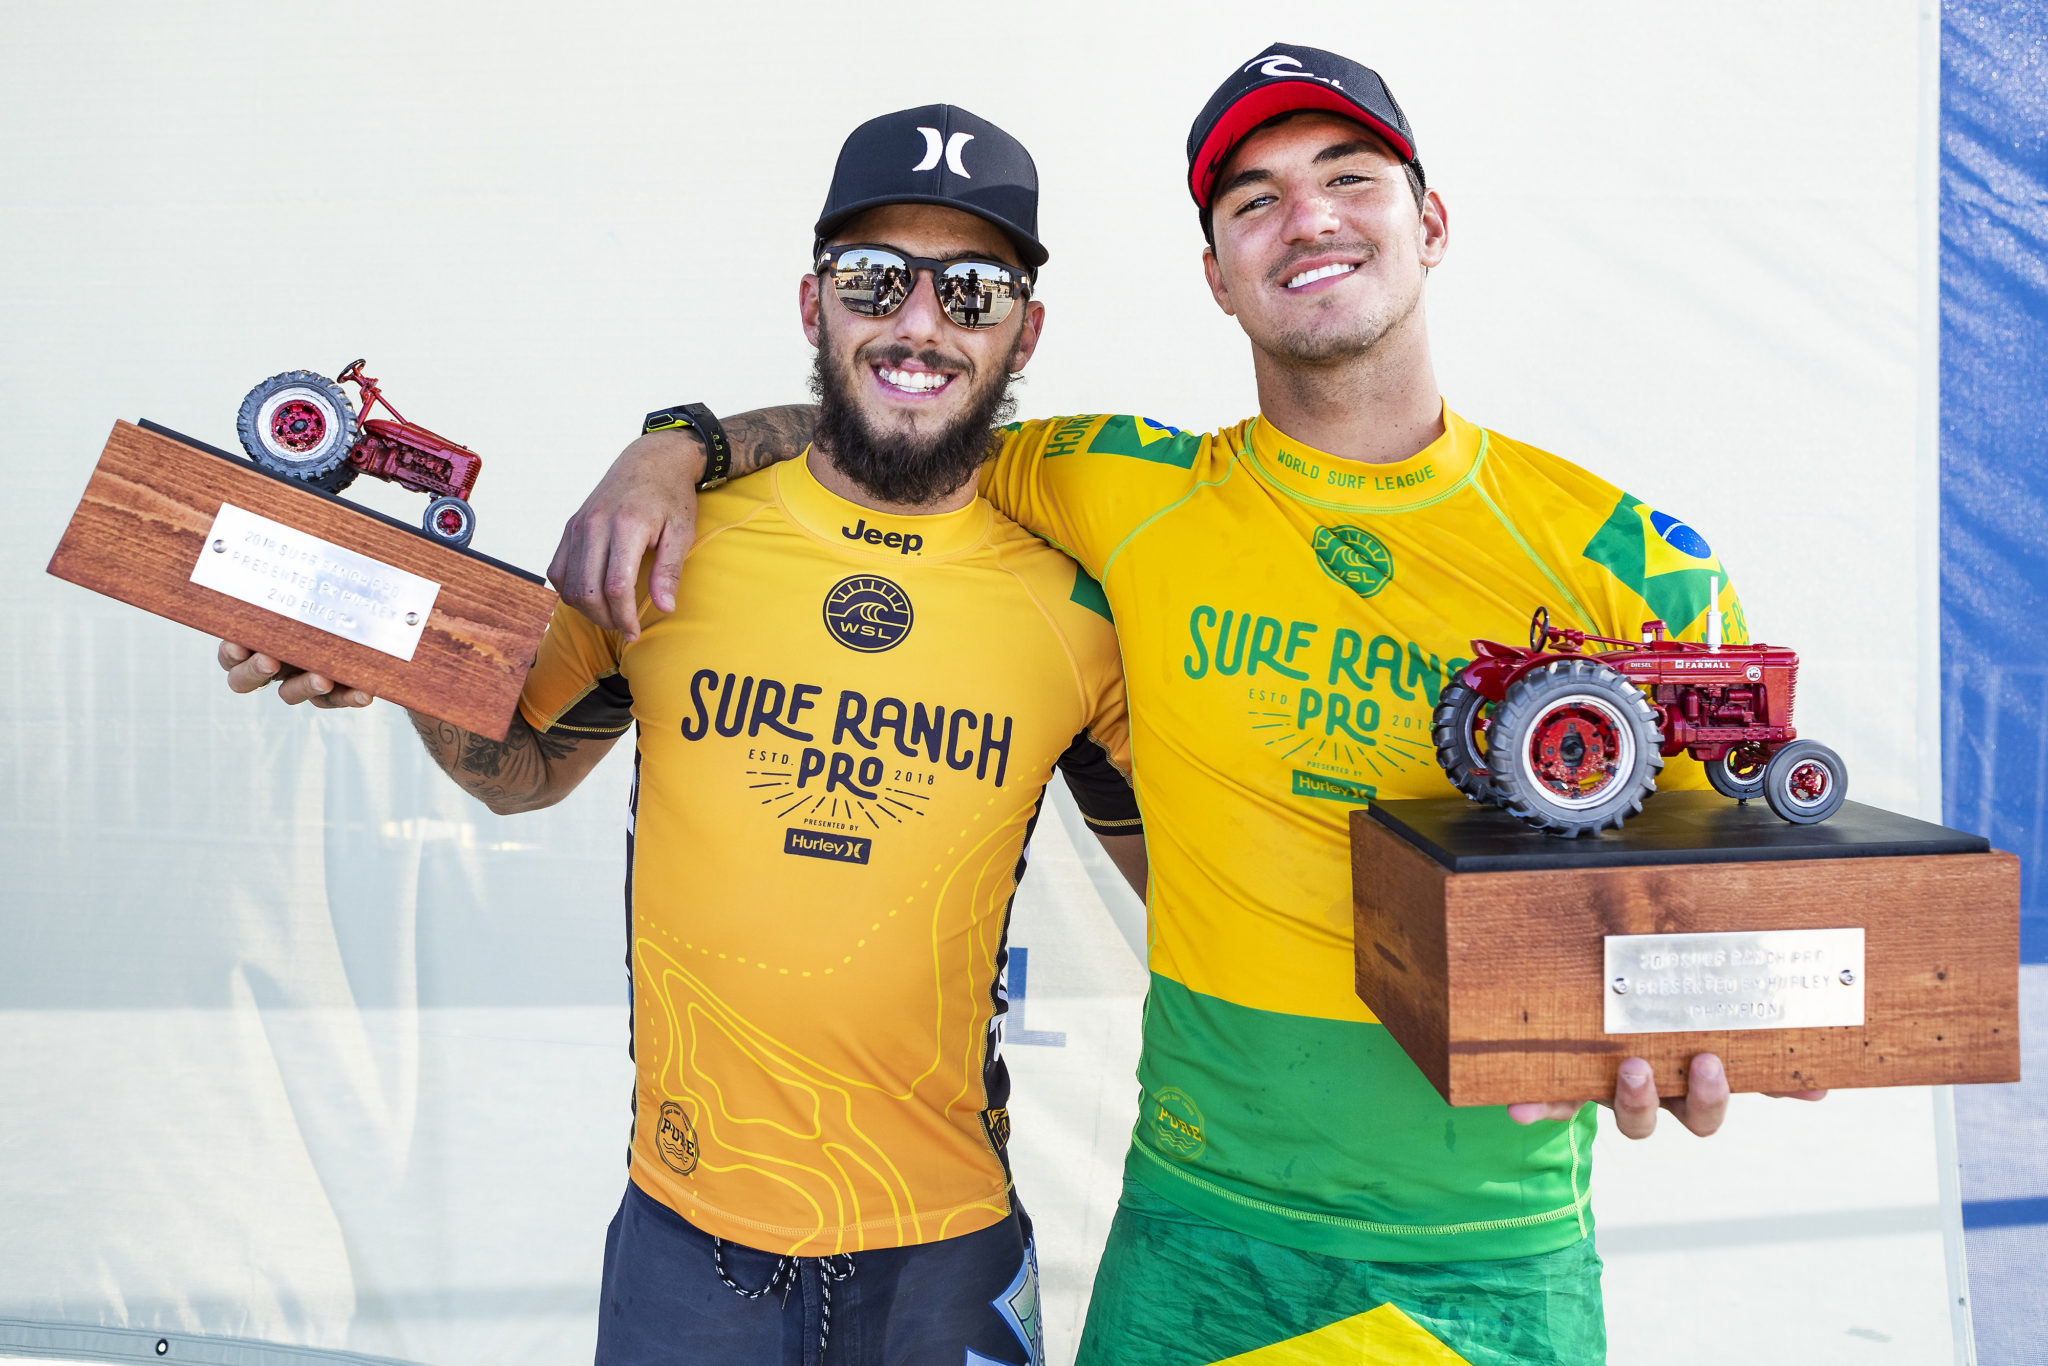 Filipe e Medina no Suirf Ranch 2018 (Kelly Cestari / WSL via Getty Images)